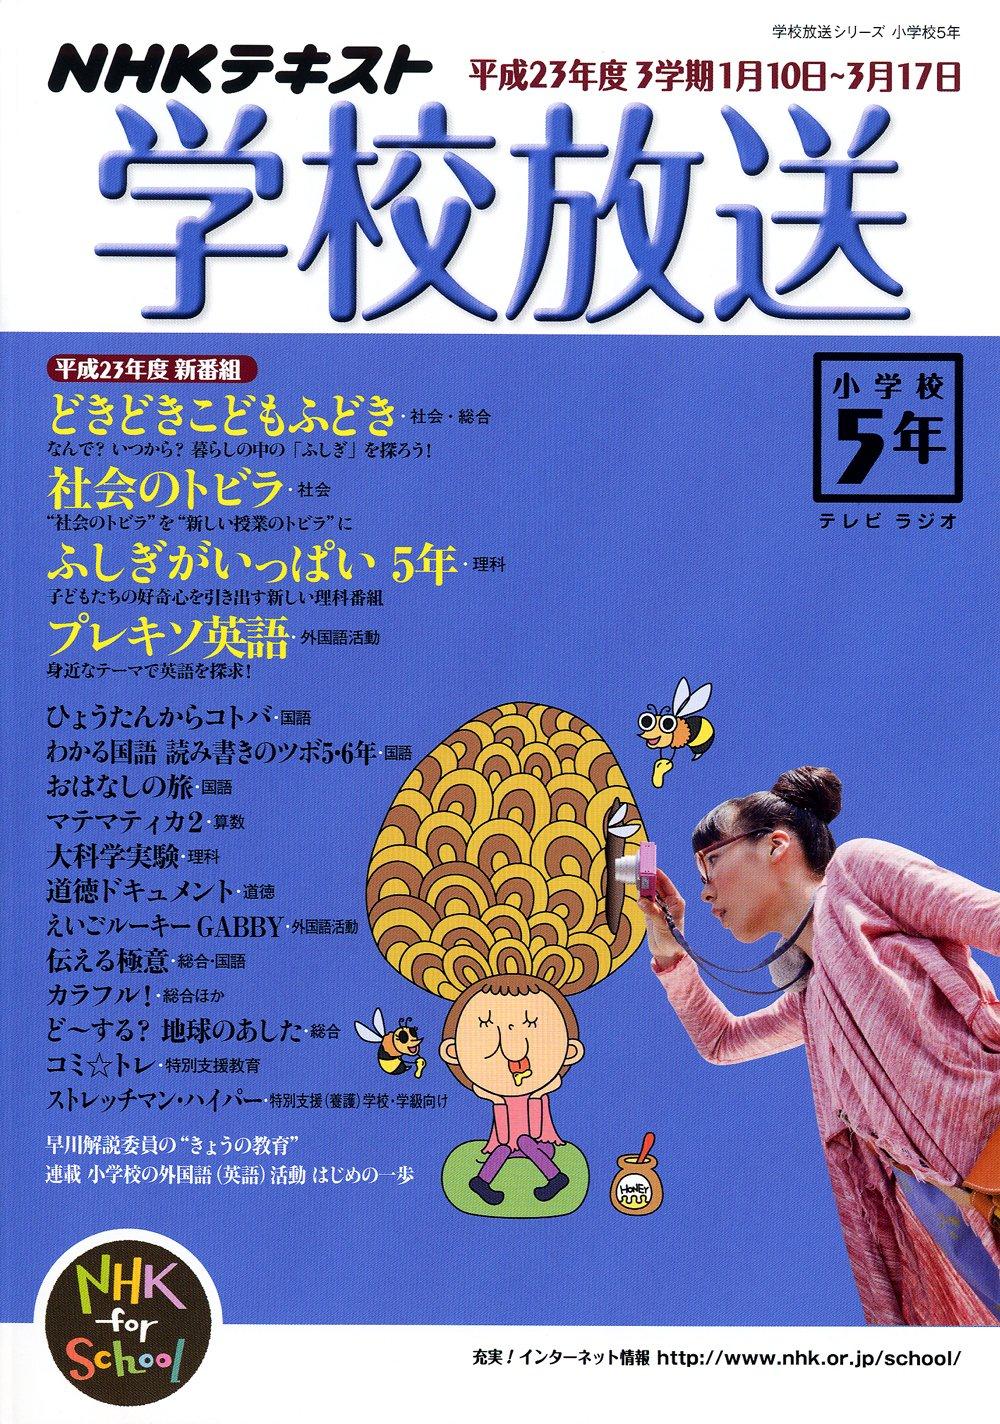 For 社会 nhk school